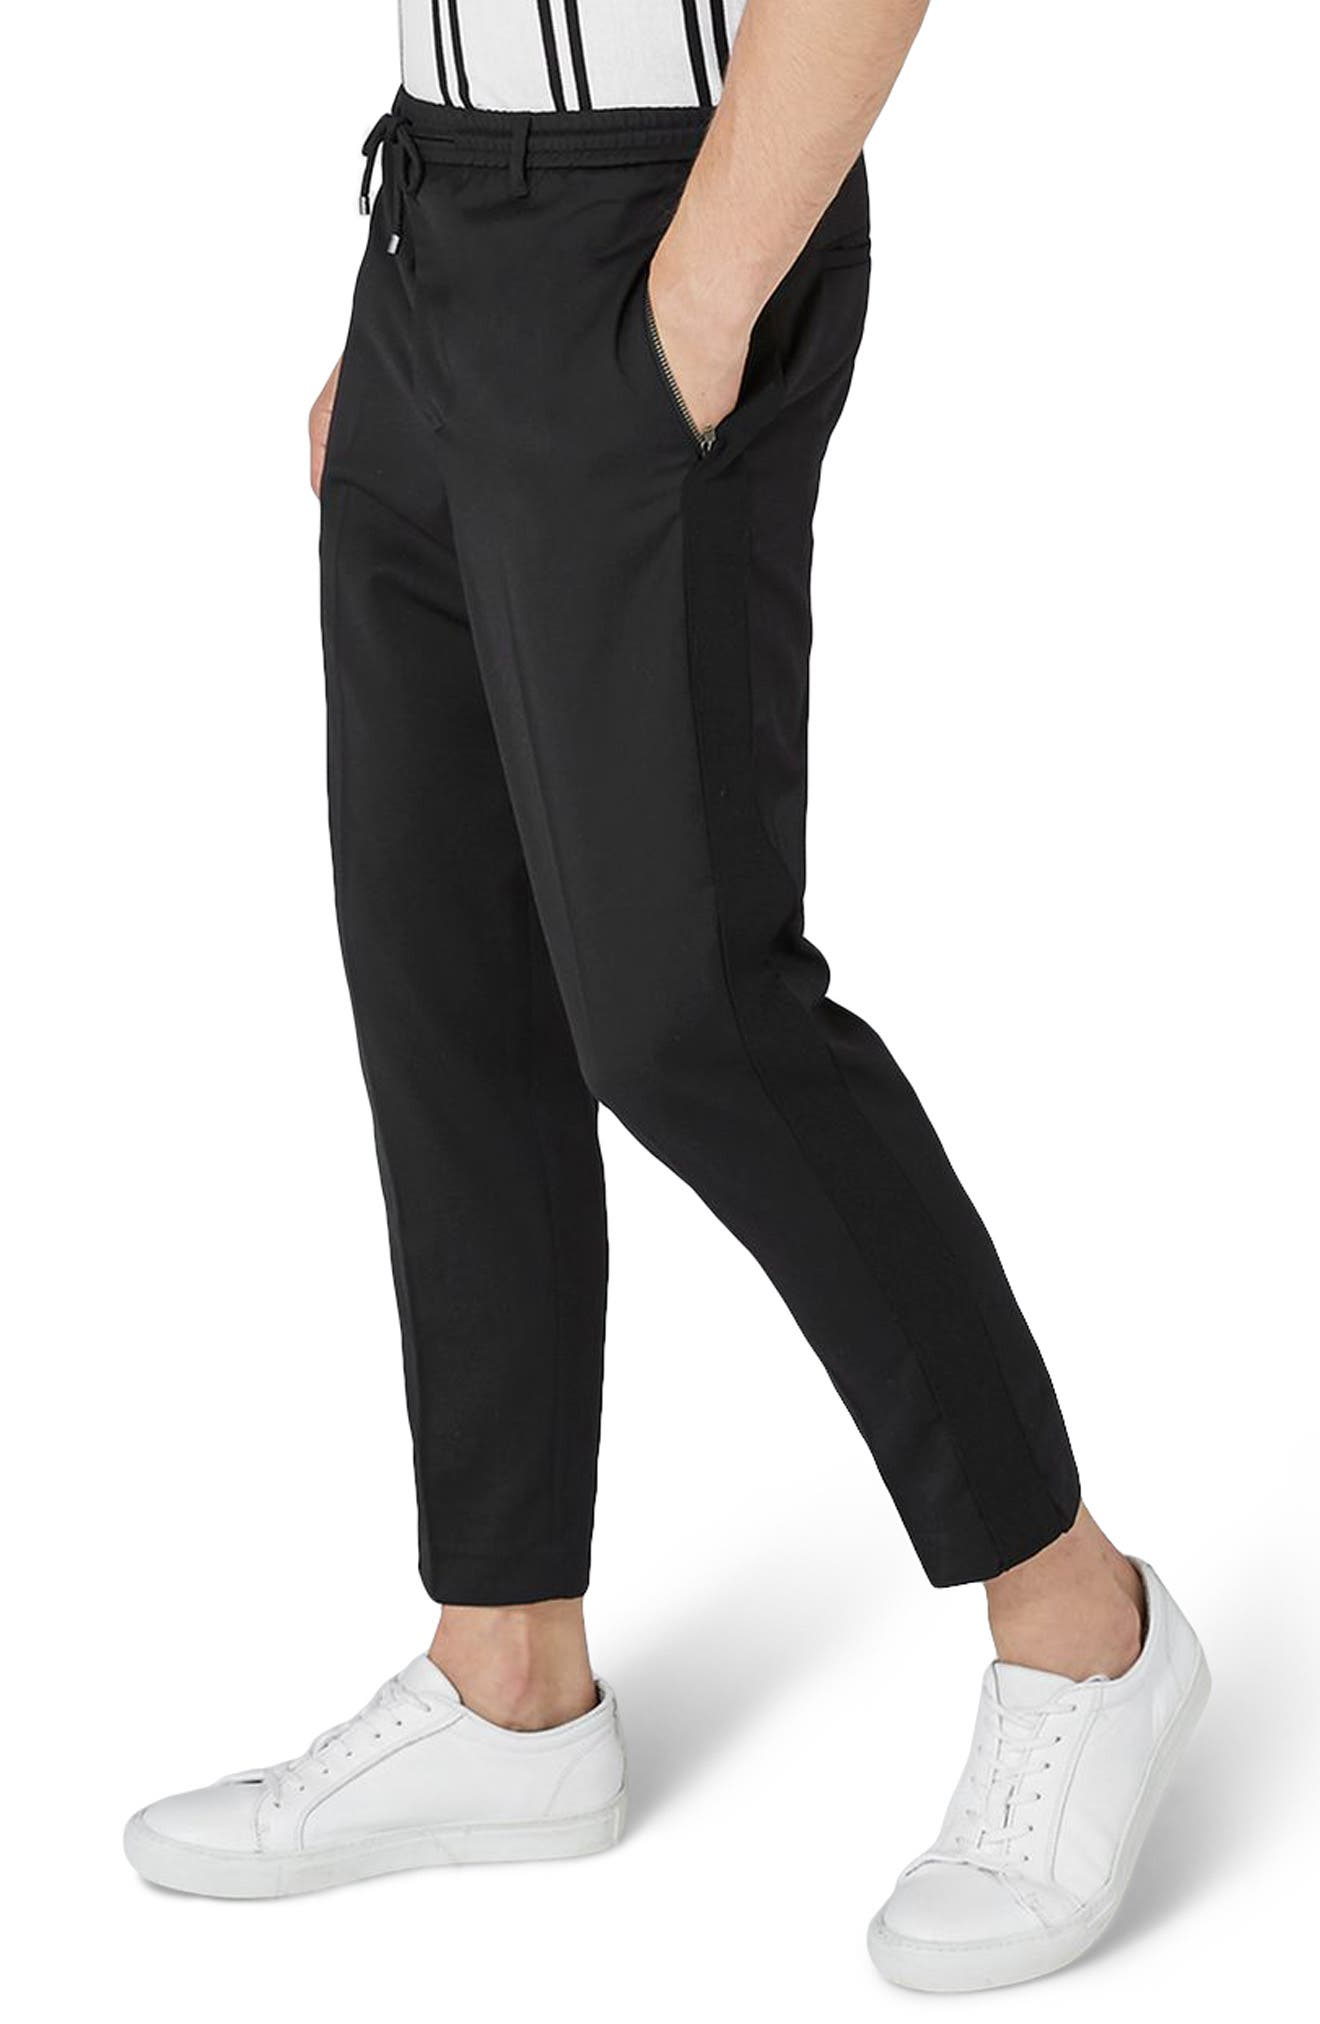 Side Zip Dress Pants,                             Main thumbnail 1, color,                             001